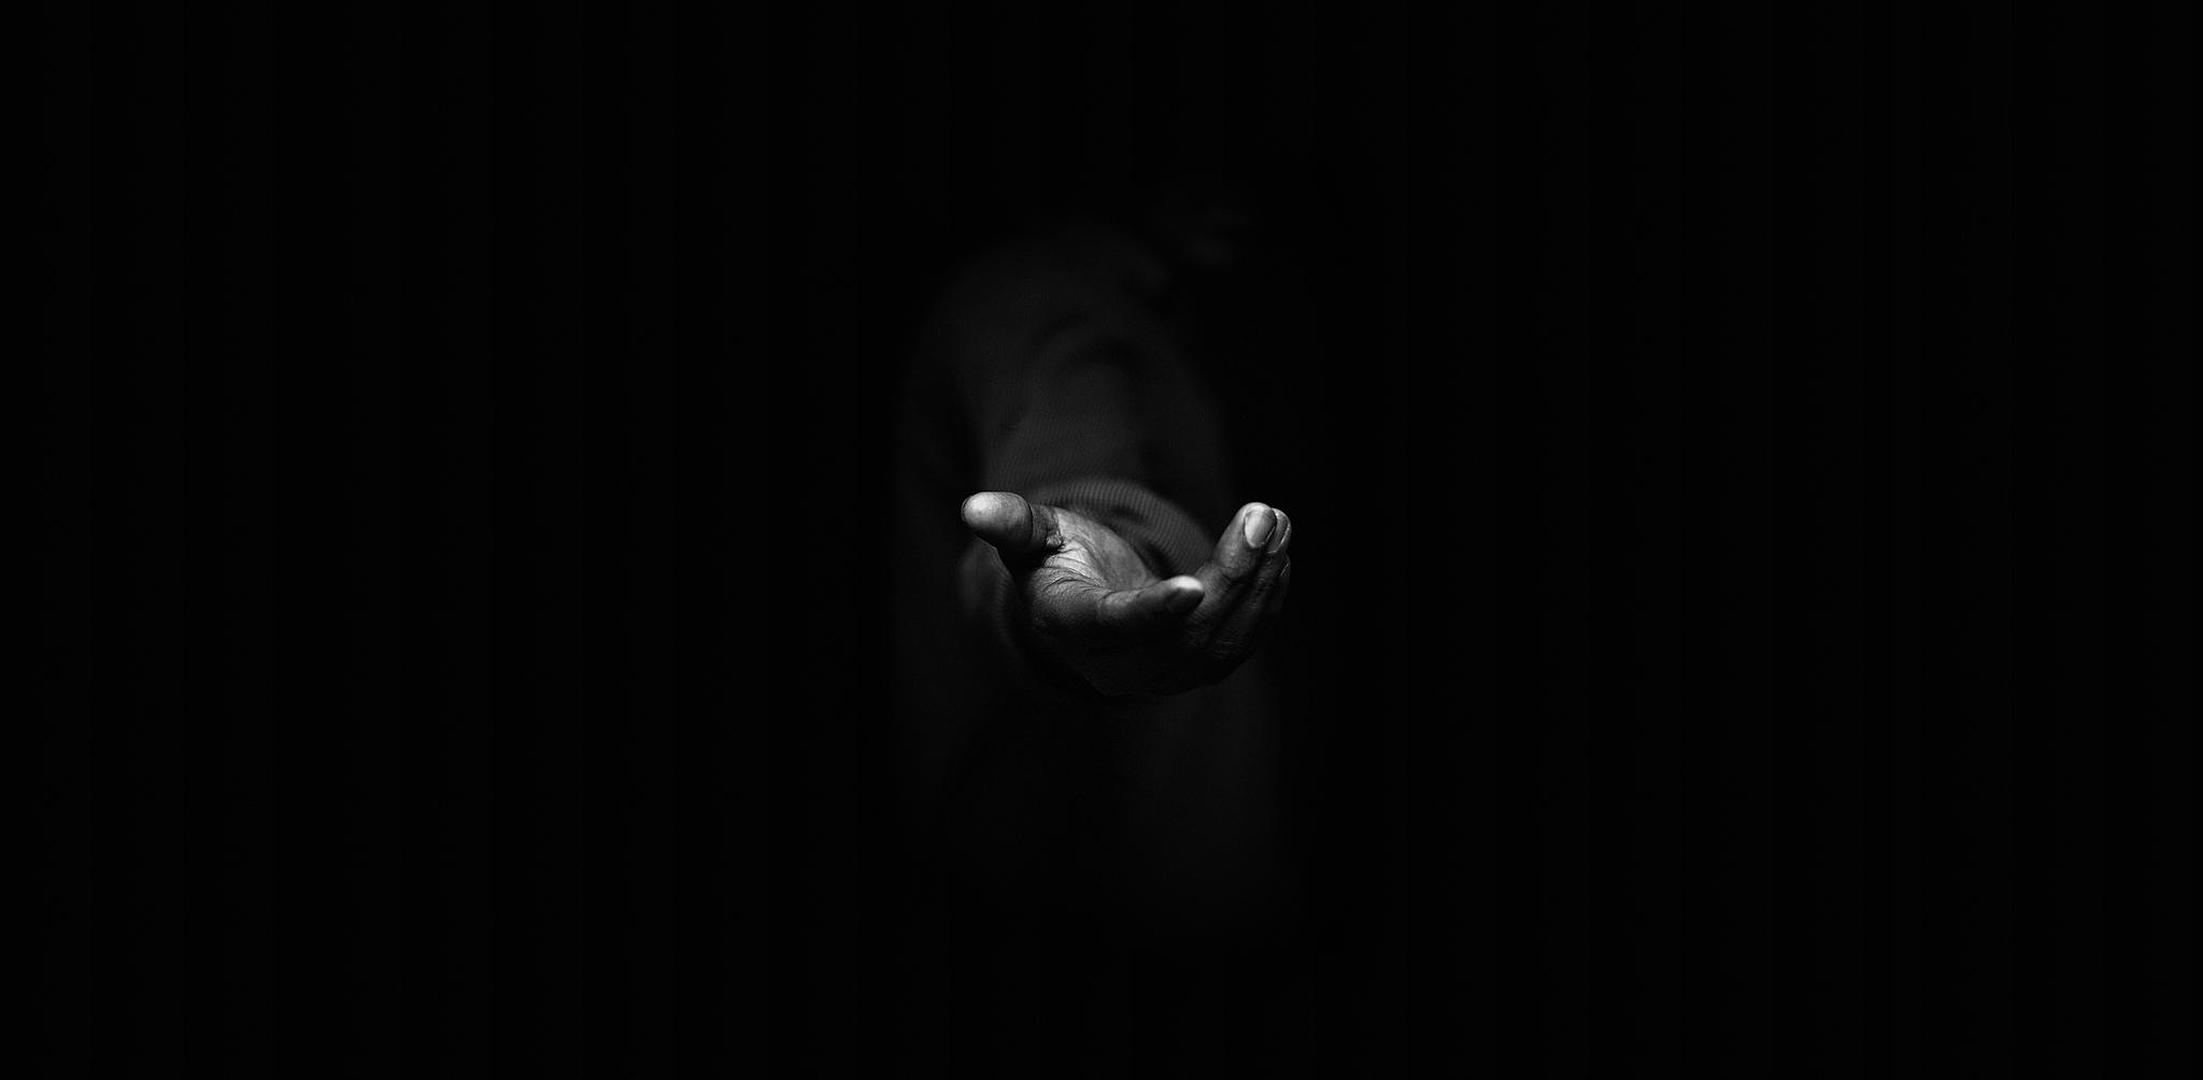 mystery-man-hand-favor-black-background-dark-fullscreen